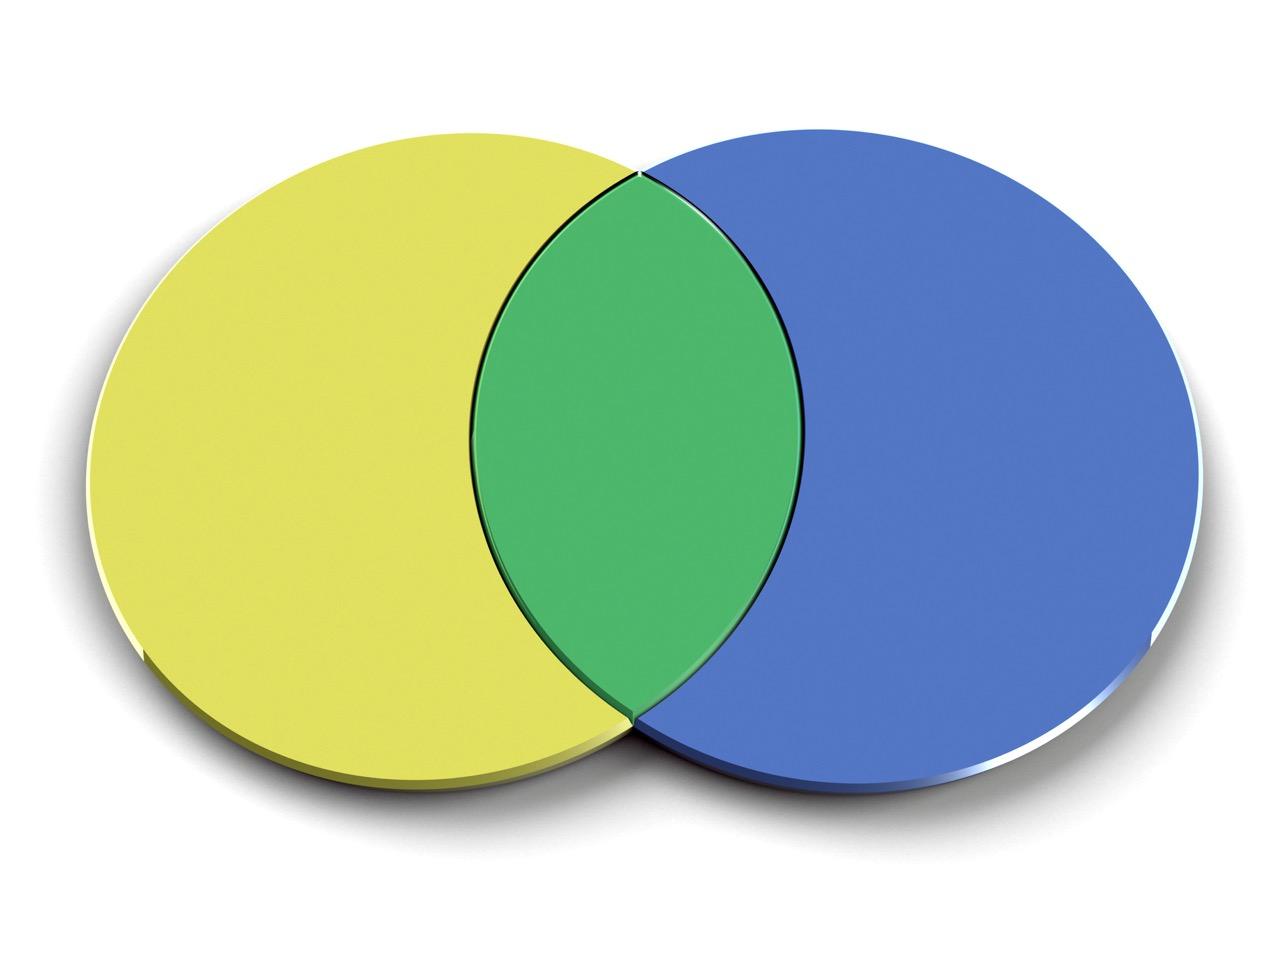 Overlapping Circles Venn Diagram | The Training Box